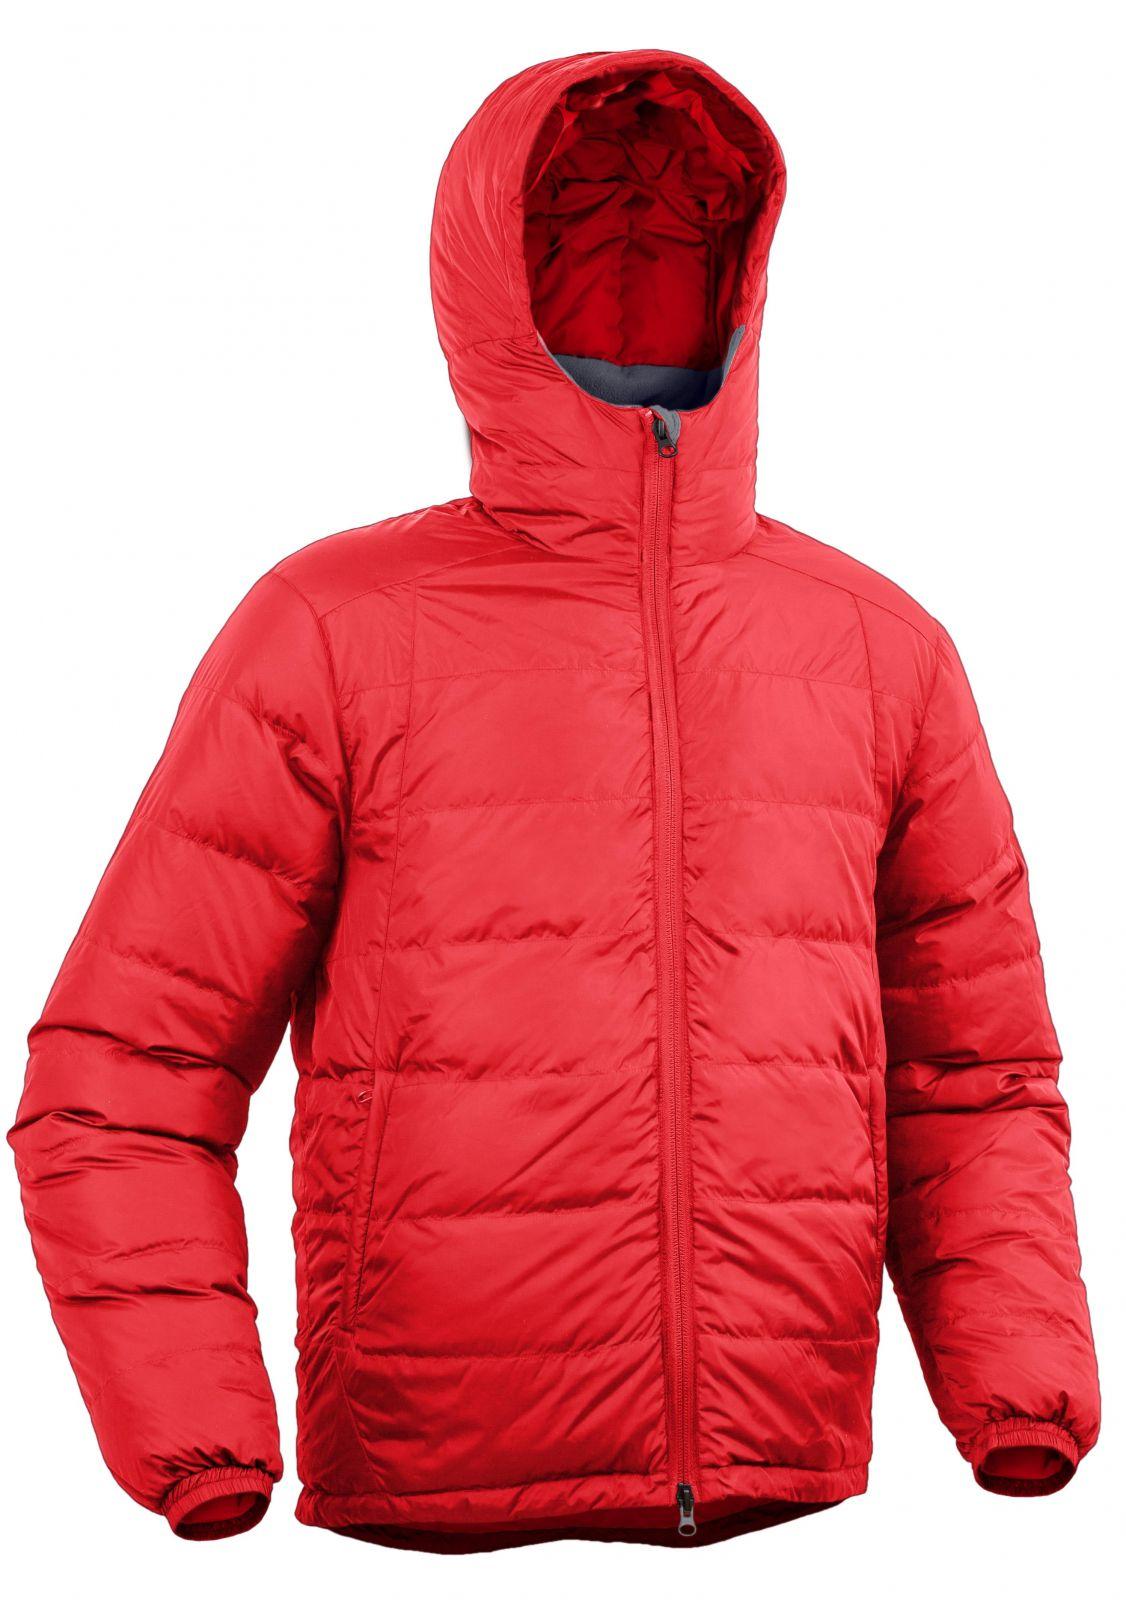 Warmpeace Pioneer formula red pánská péřová bunda